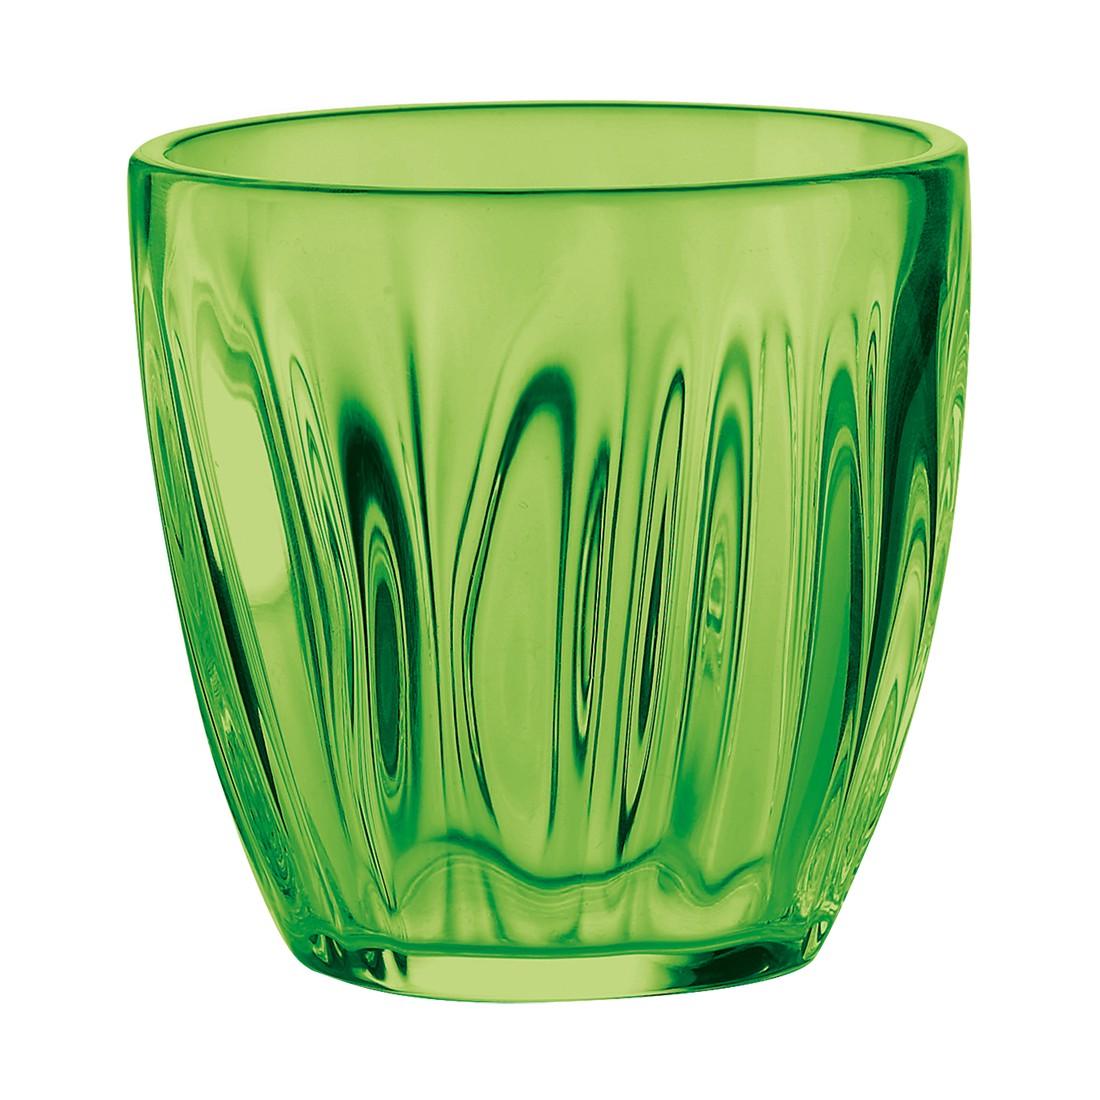 Wasserglas Aqua – Kunststoff Grün, Guzzini günstig online kaufen